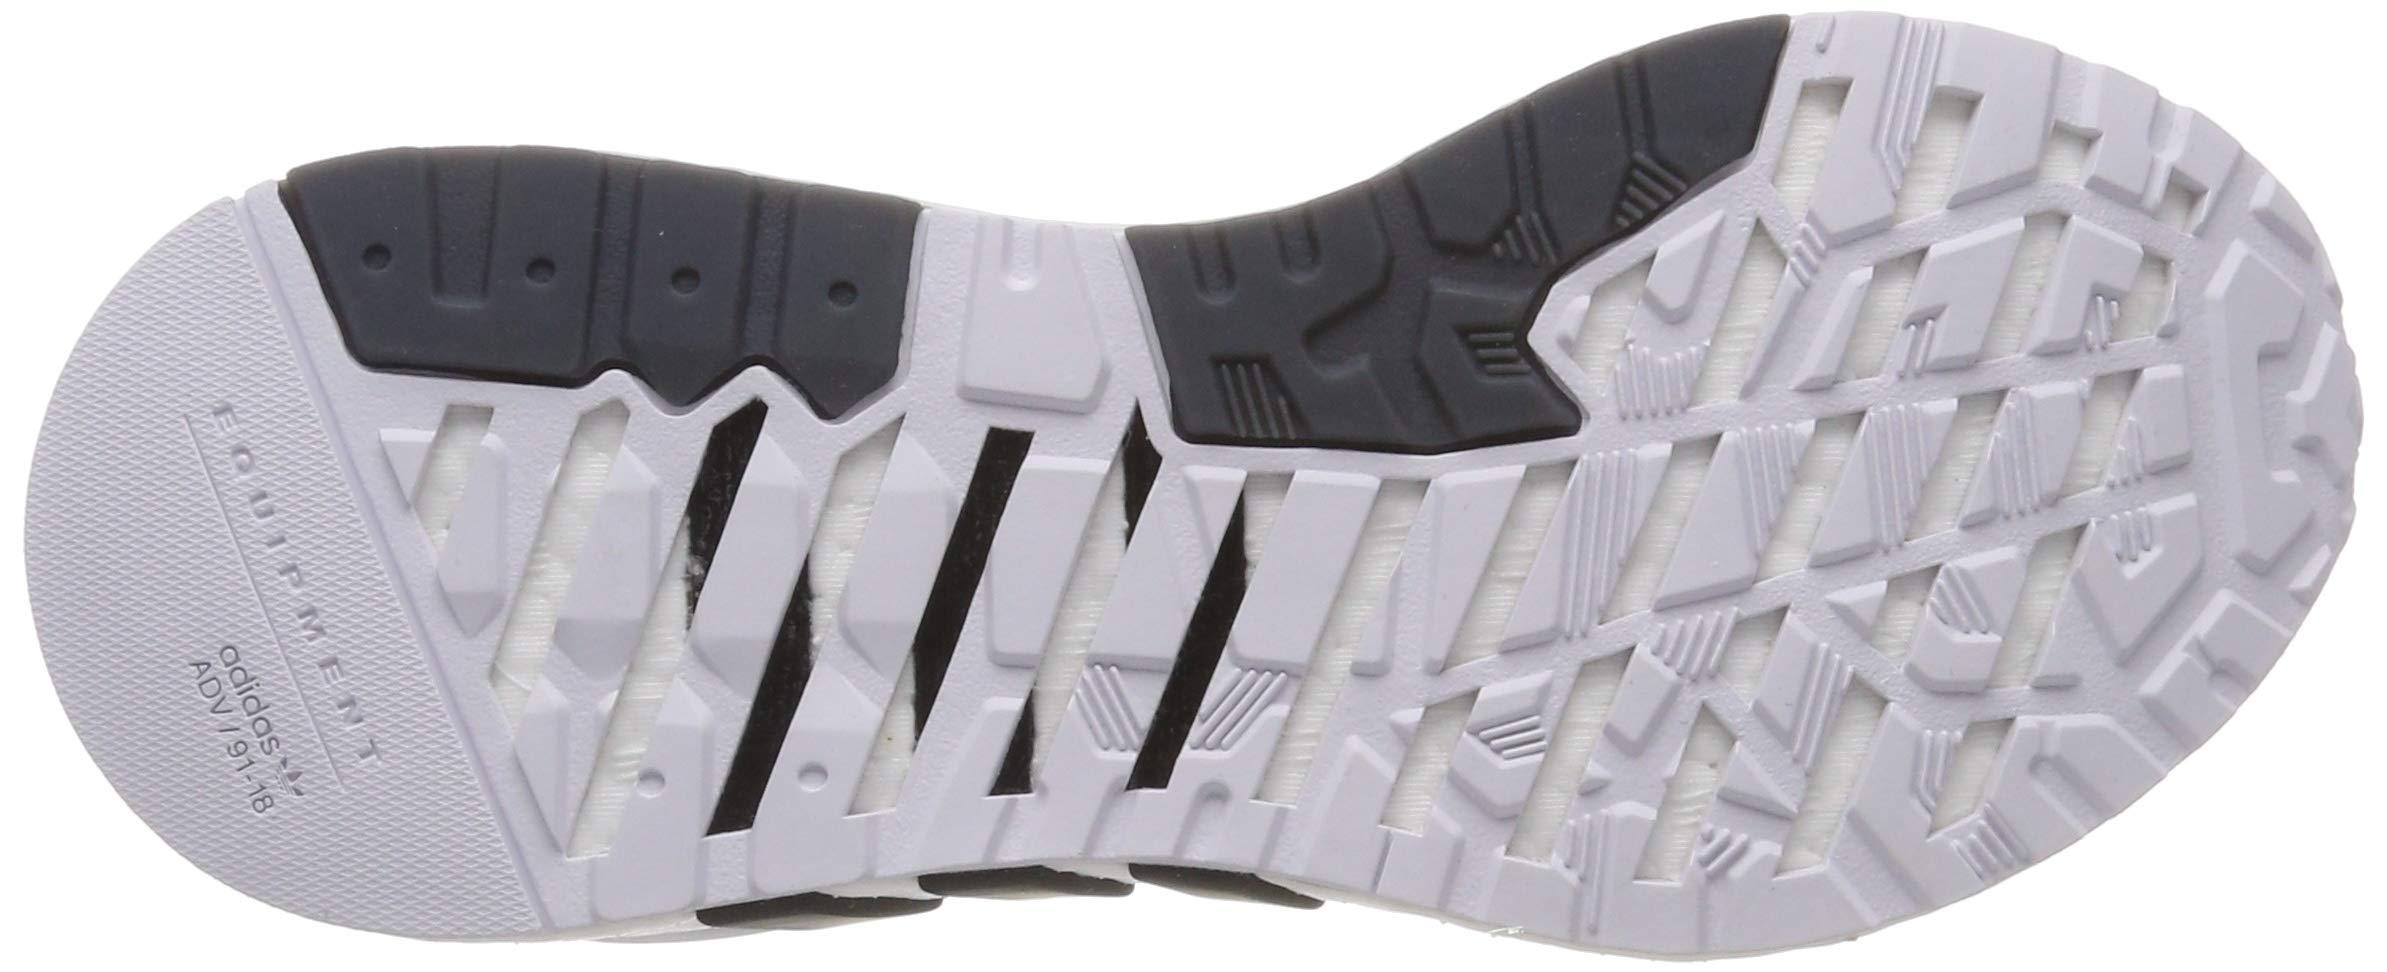 adidas EQT Support 91/18, Scarpe da Fitness Uomo 3 spesavip